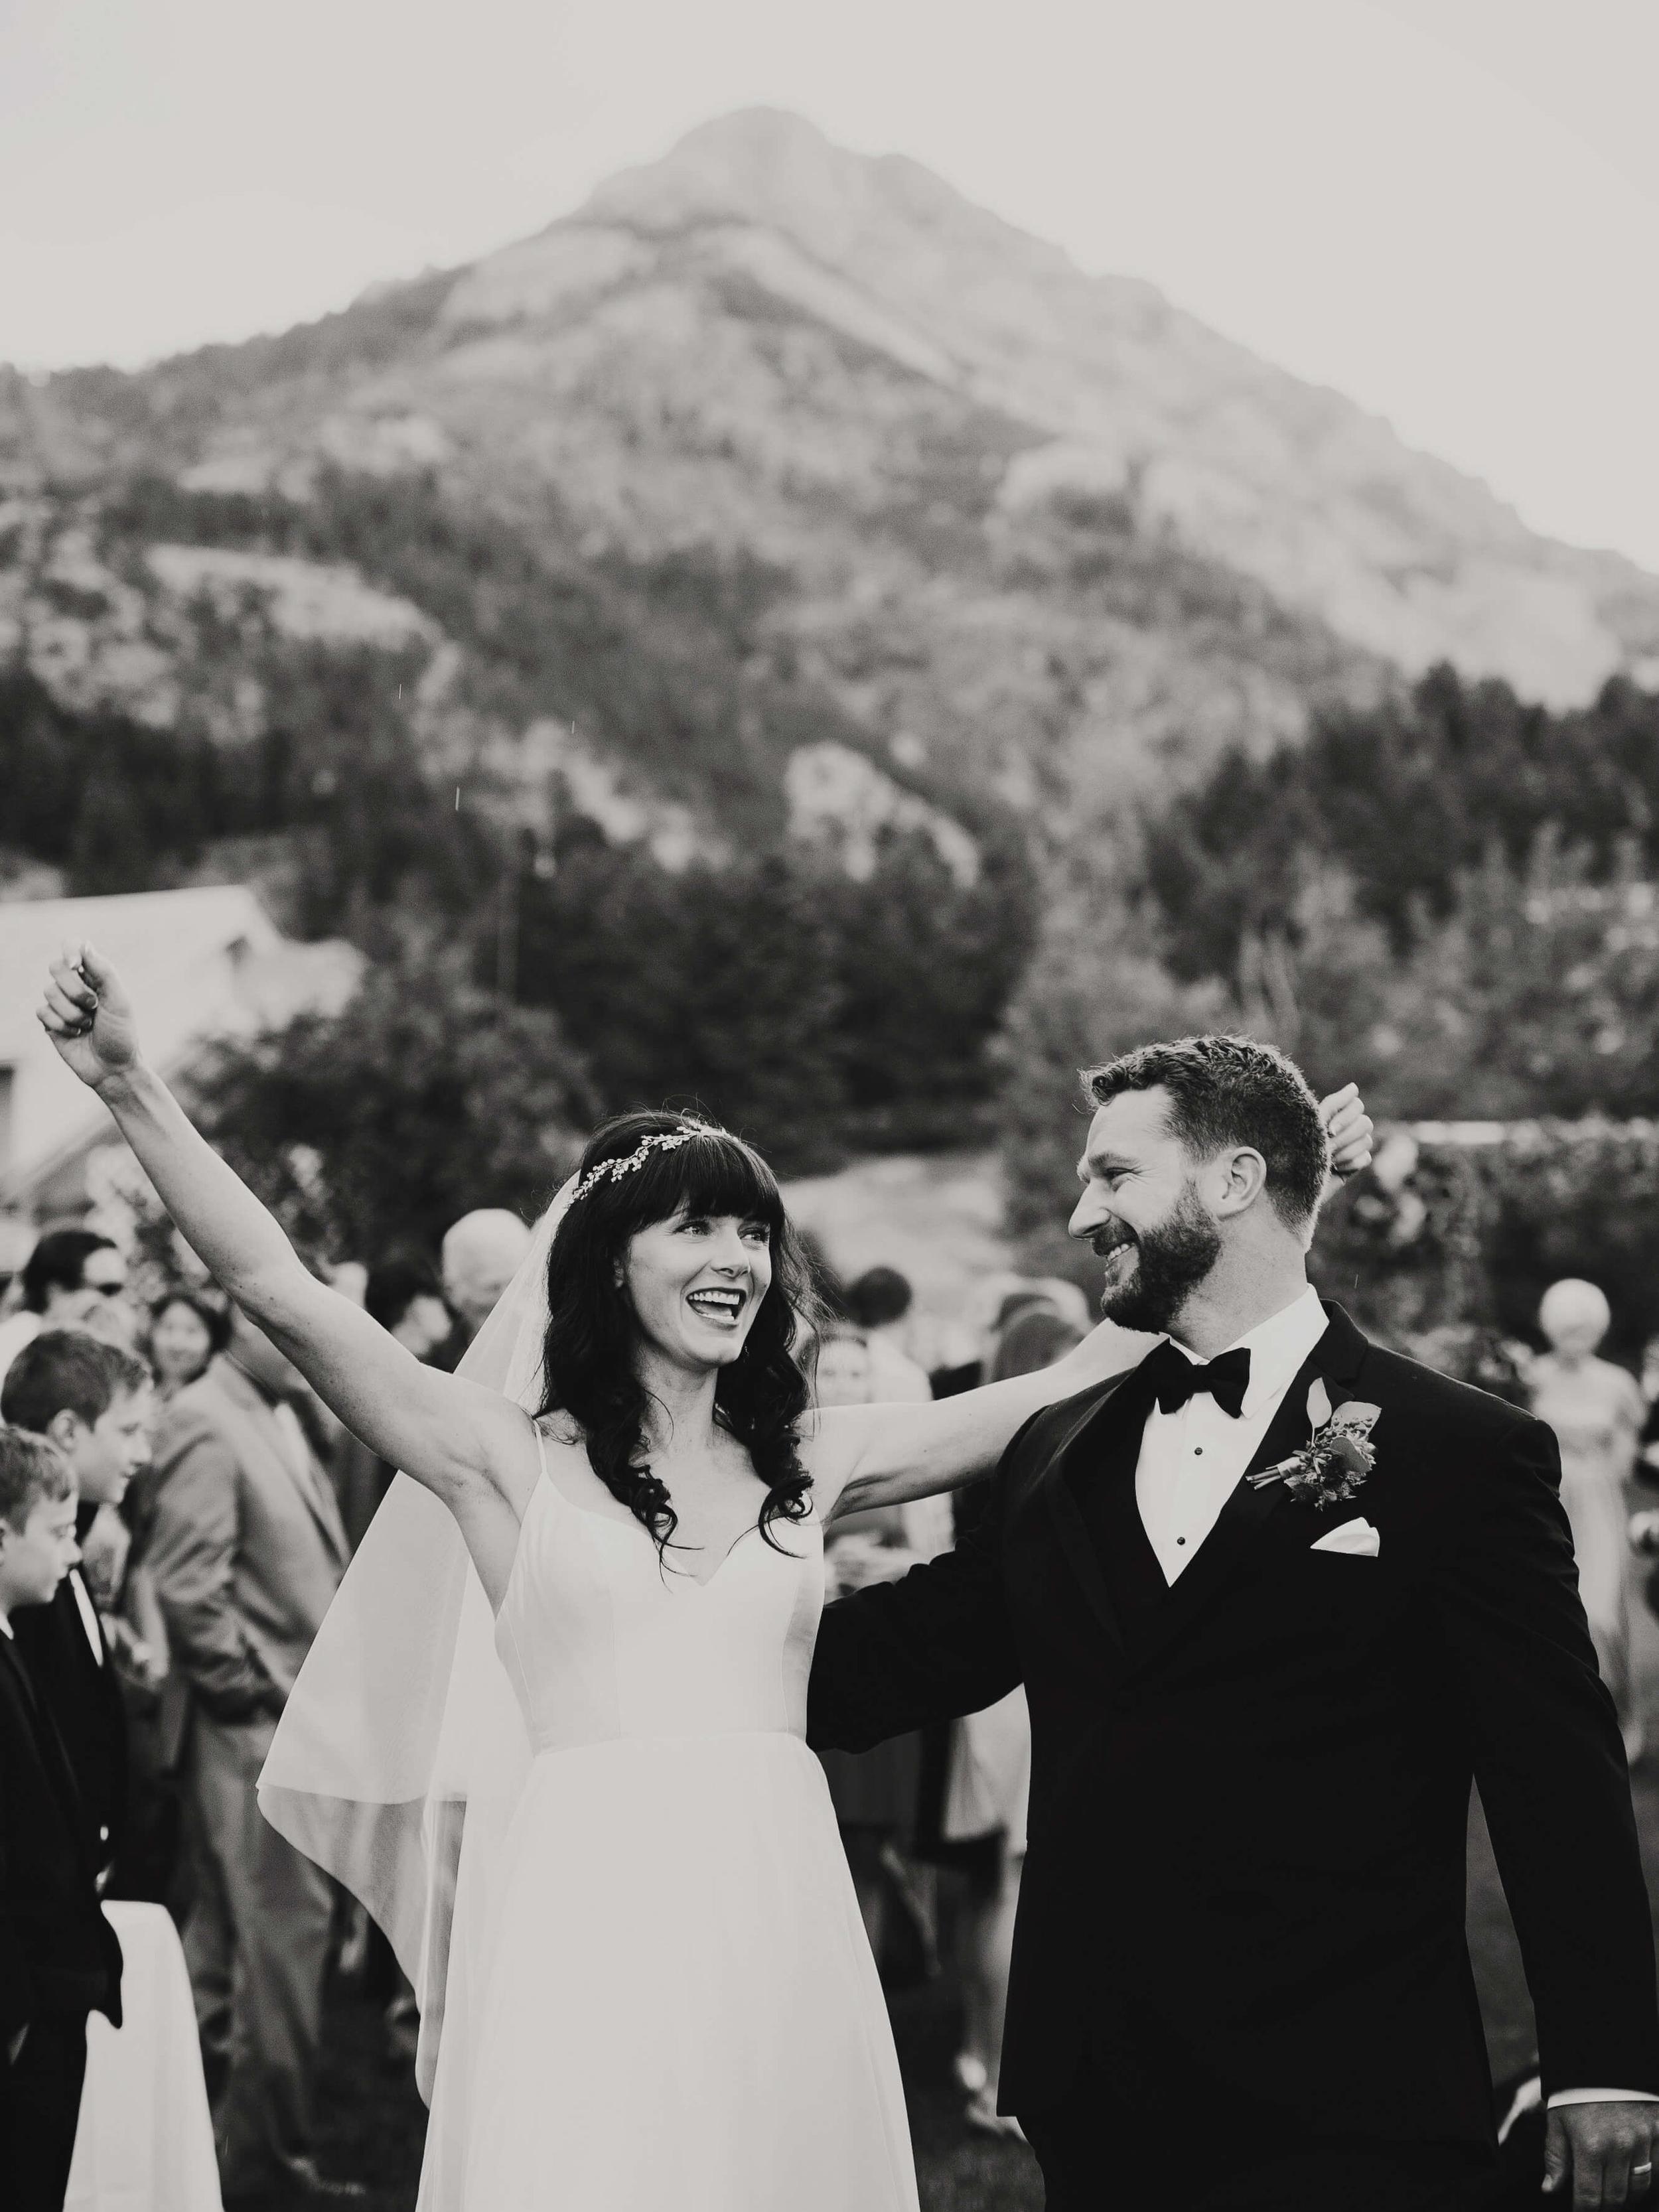 engle-olson-fran-ze-photo-montana-wedding-87.jpg